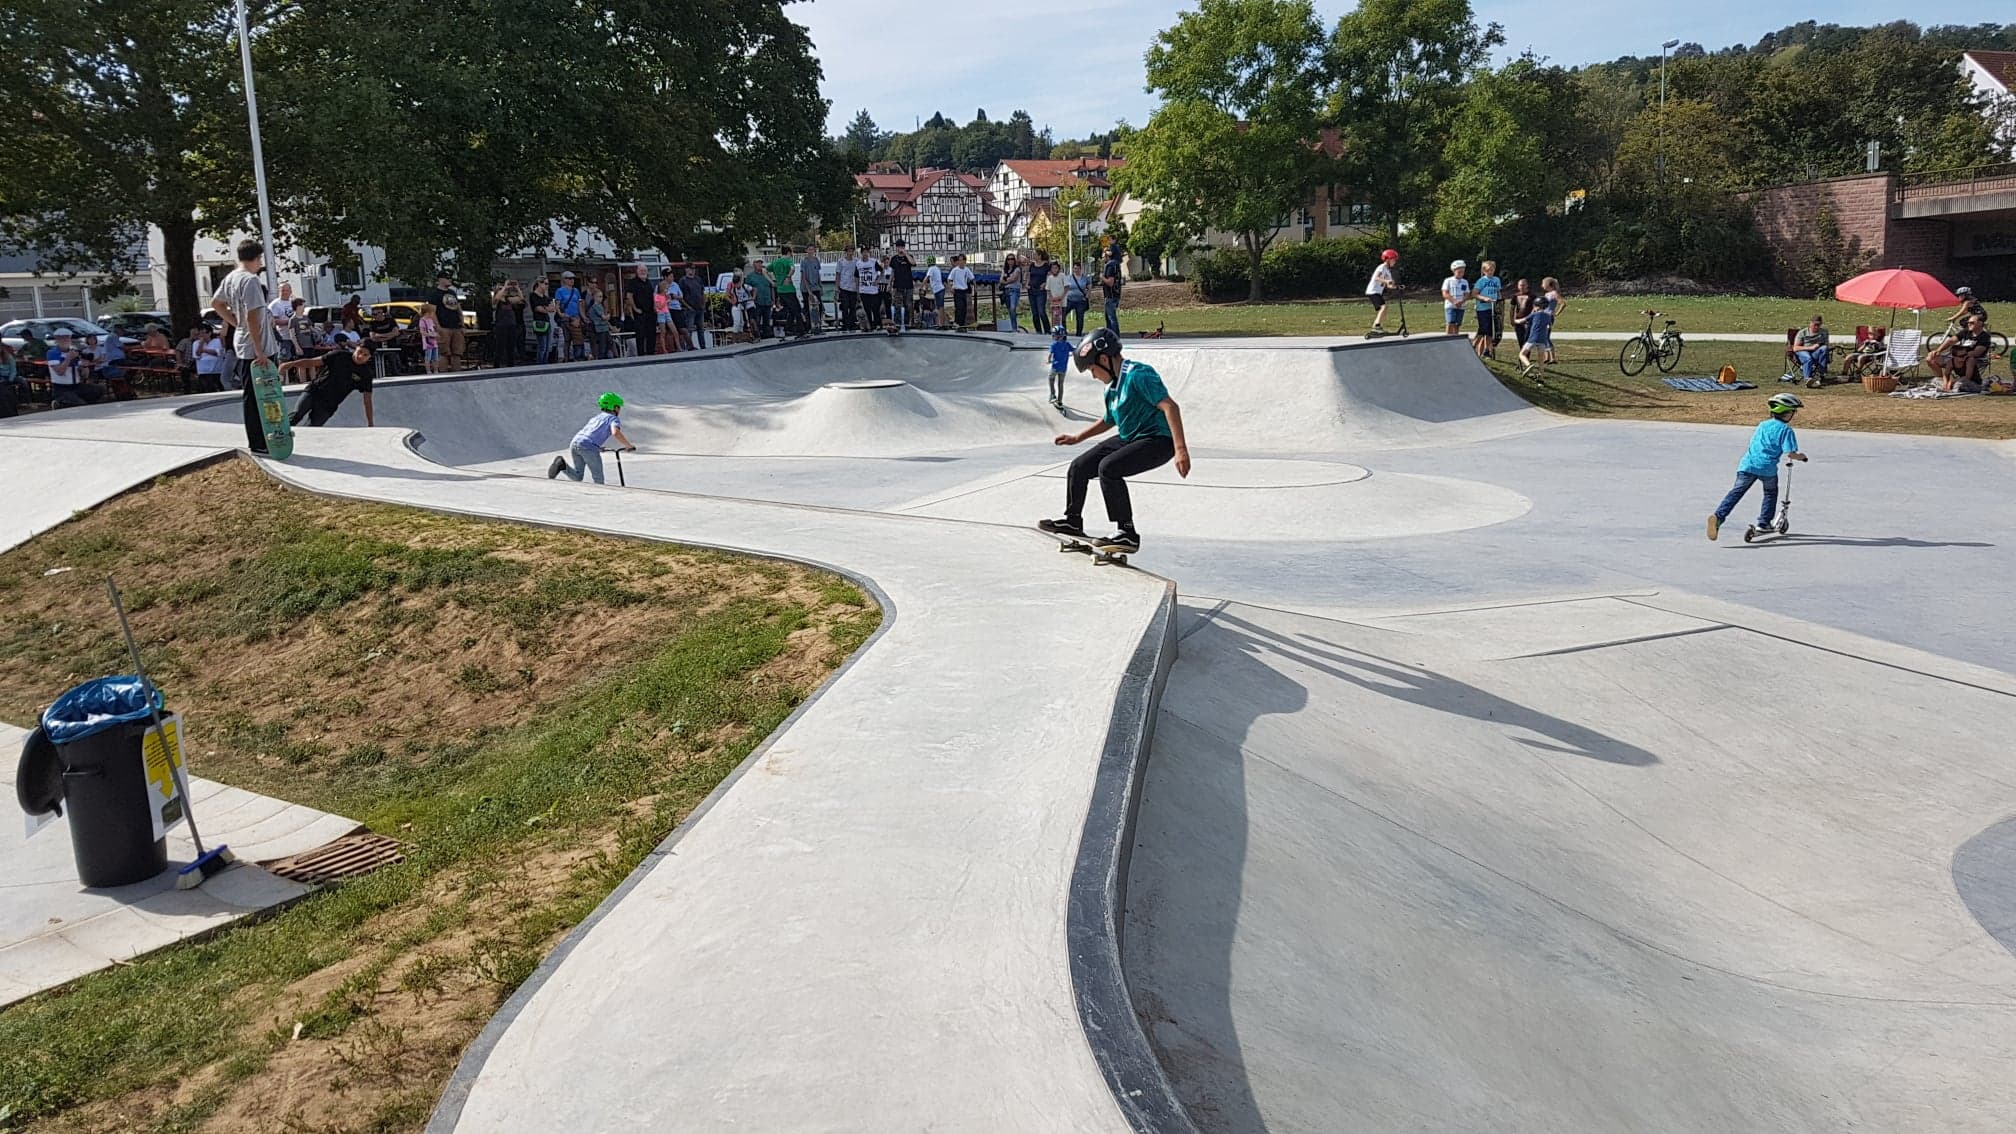 Skatepark Melsungen